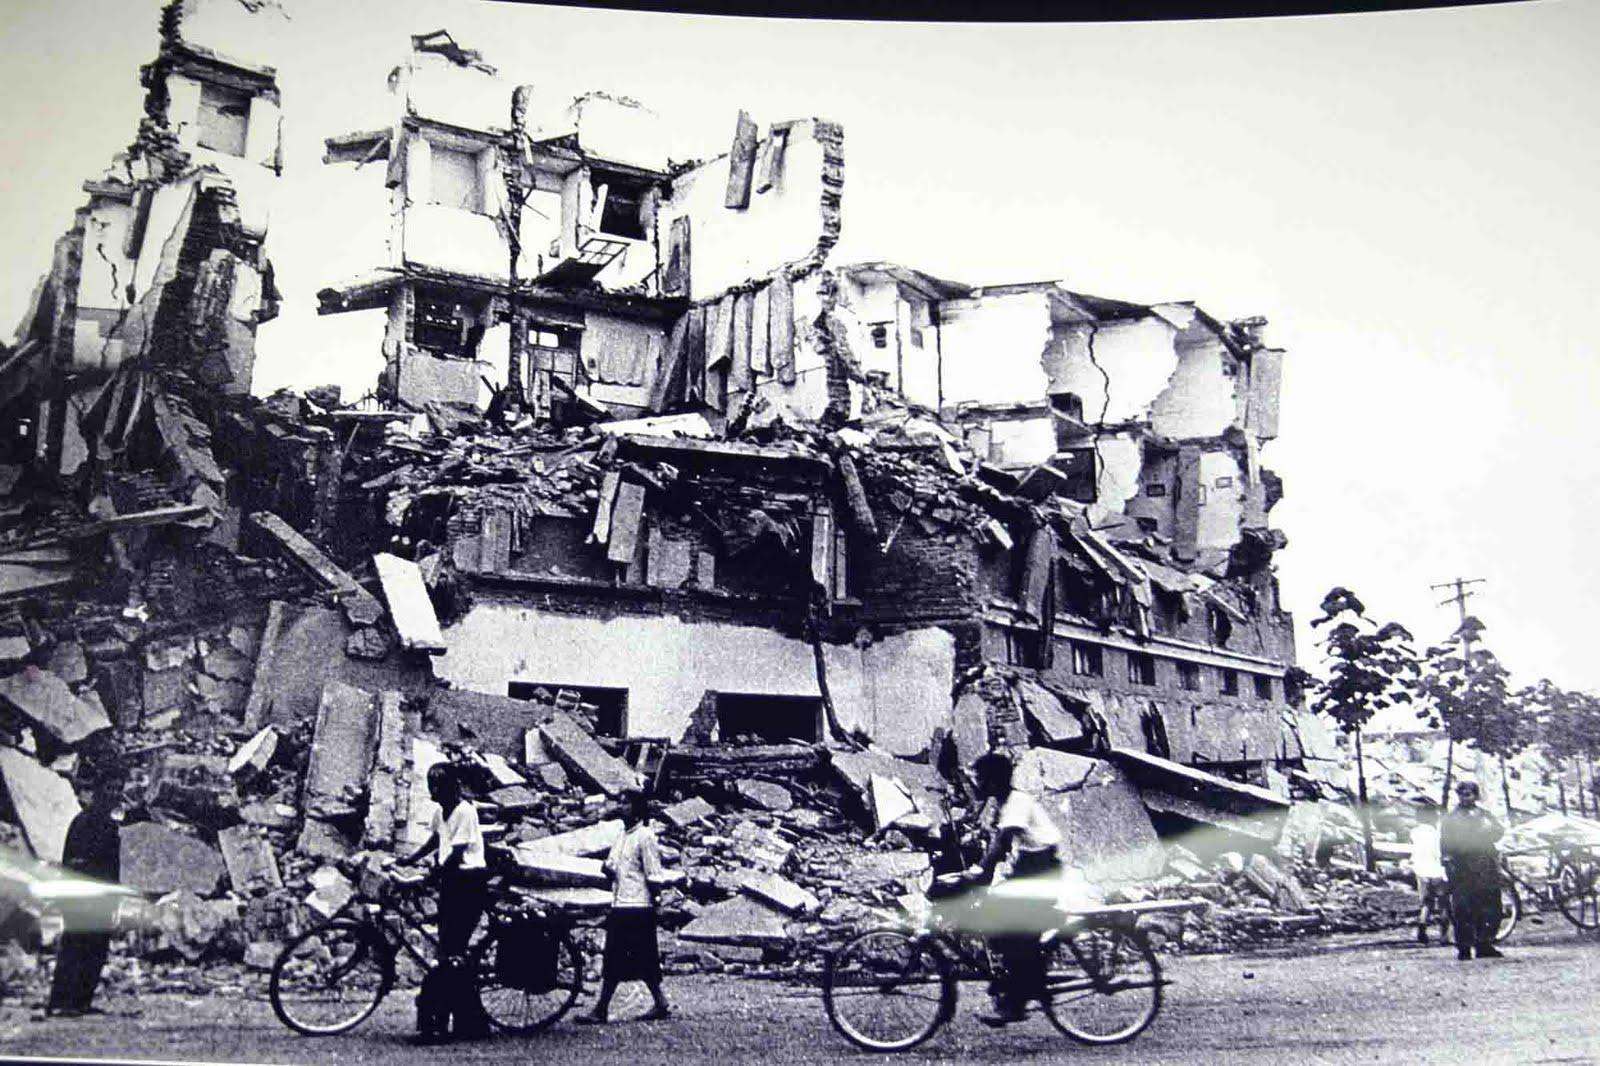 Tangshan, China (1976)